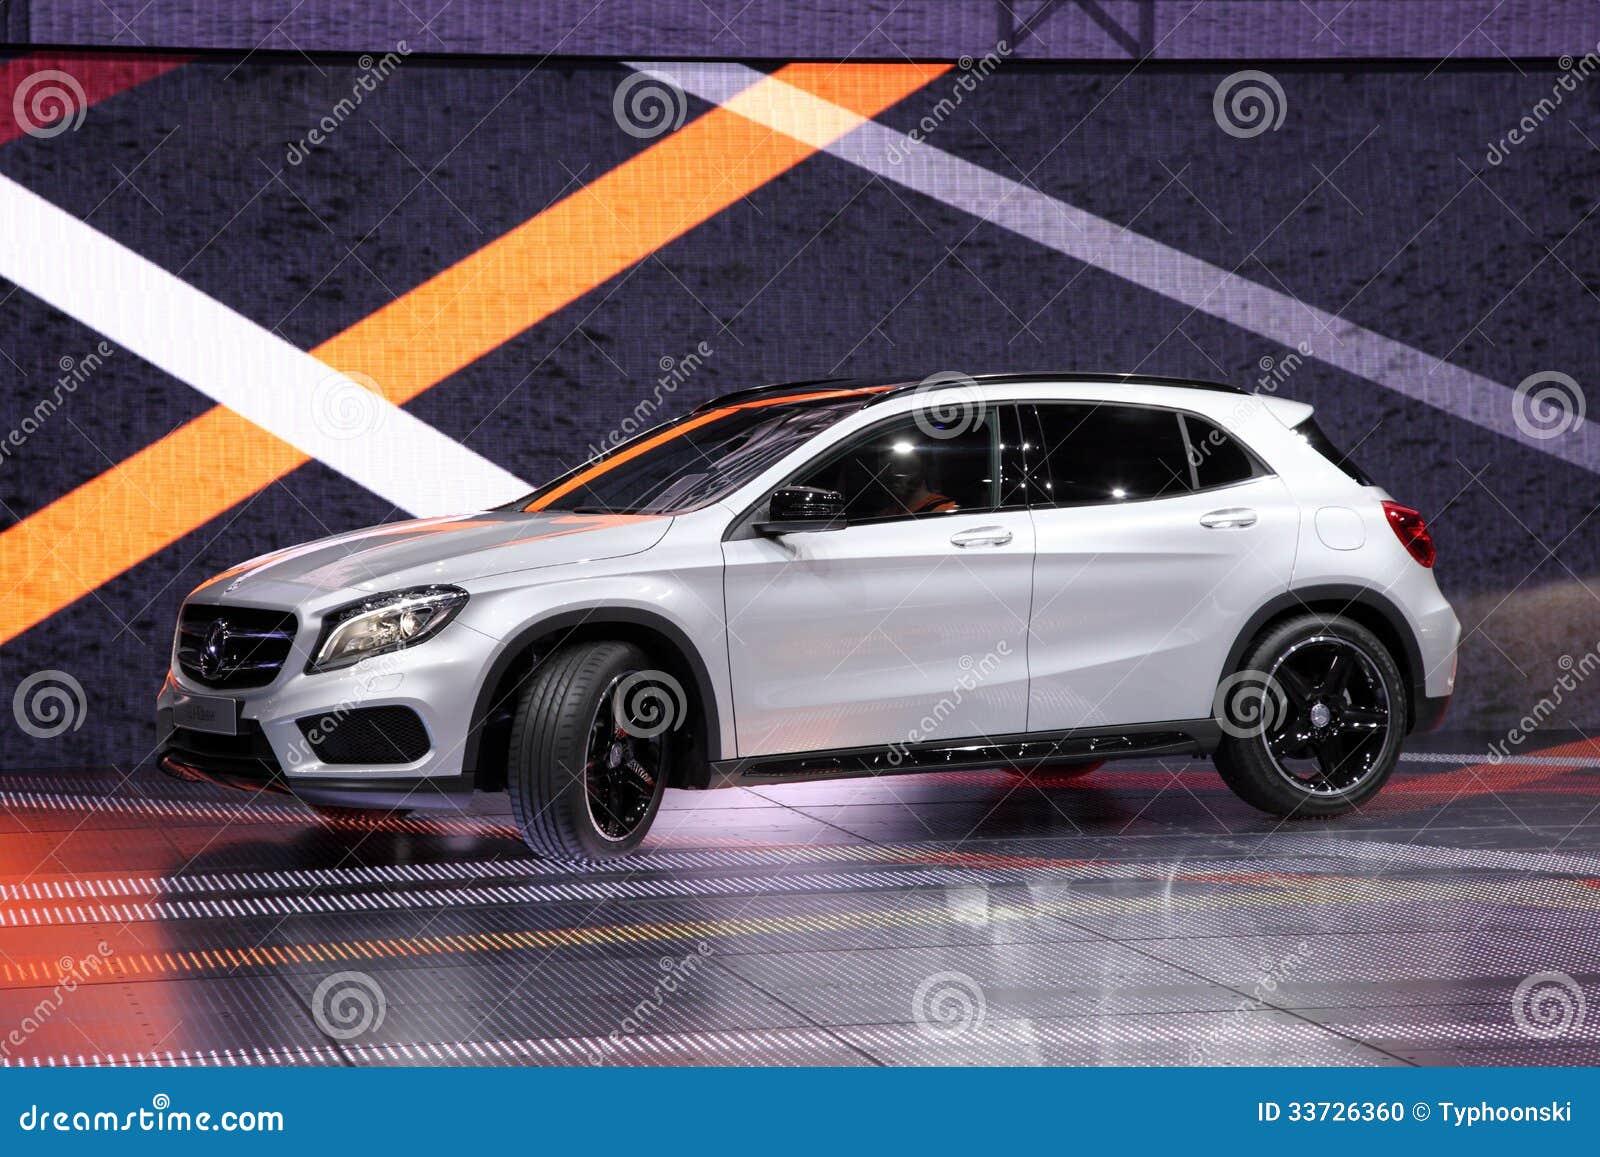 Mercedes Benz Germany Company Profile